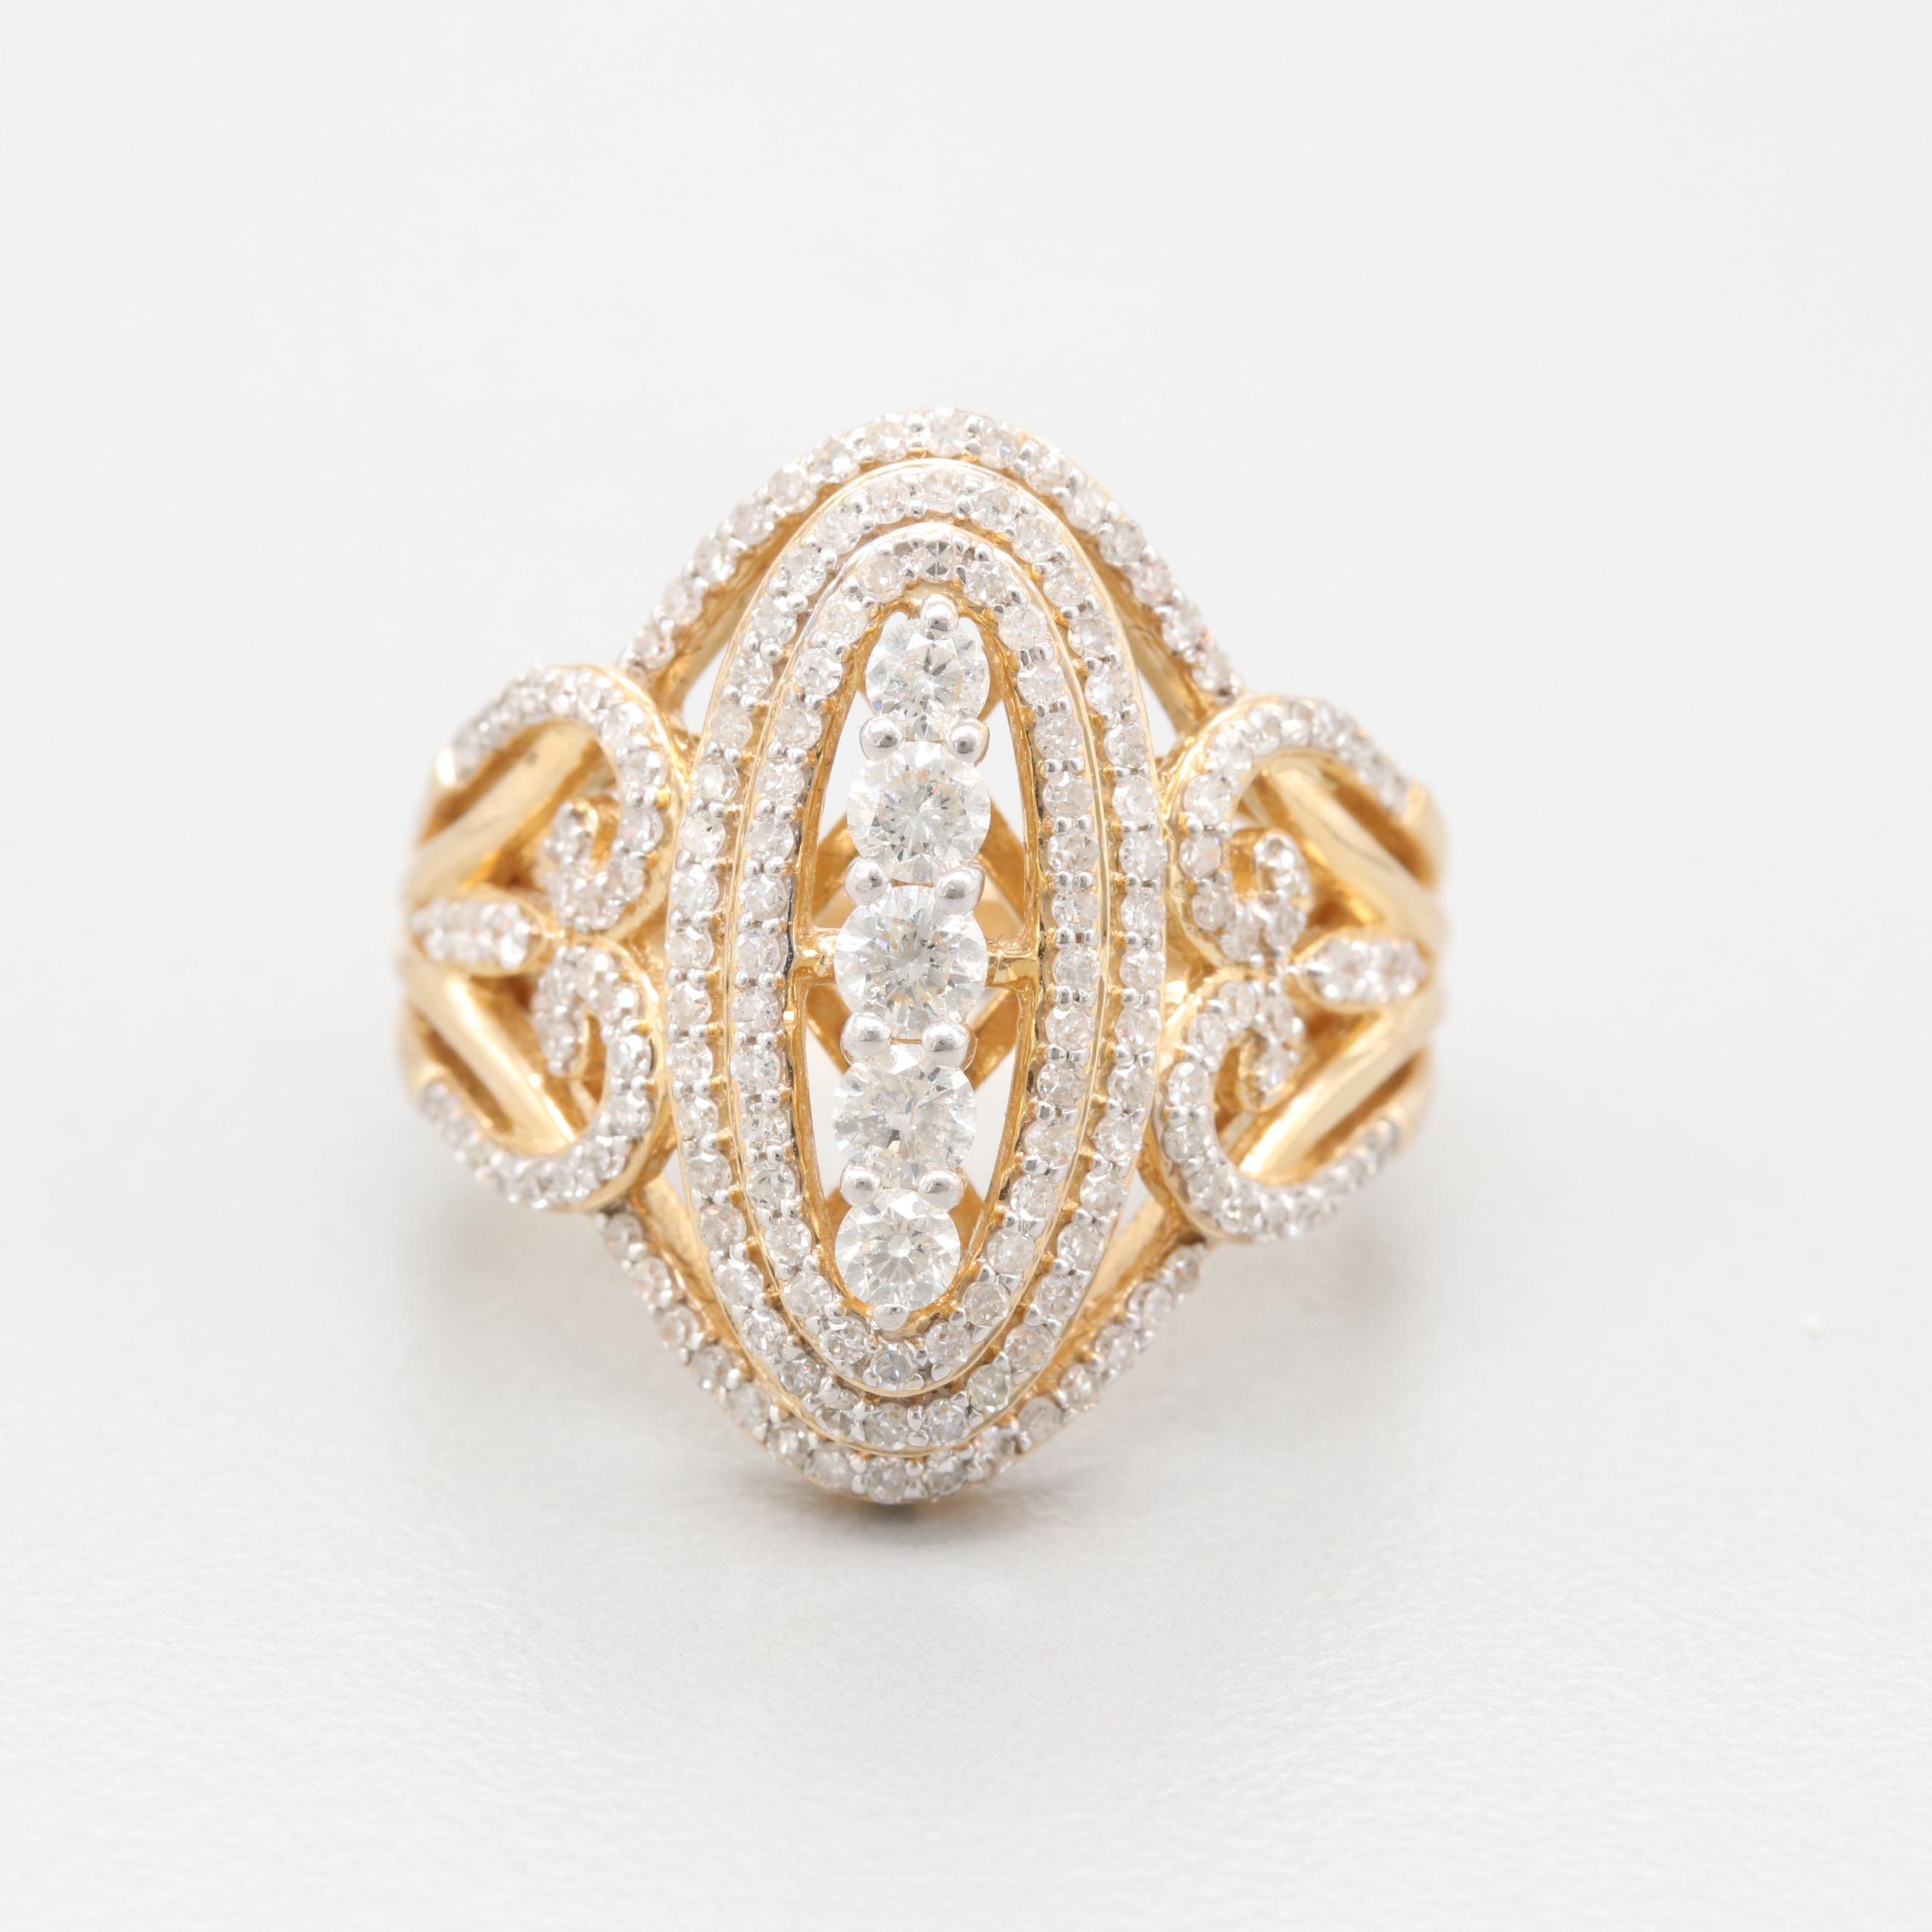 14K Yellow Gold 1.04 CTW Diamond Ring